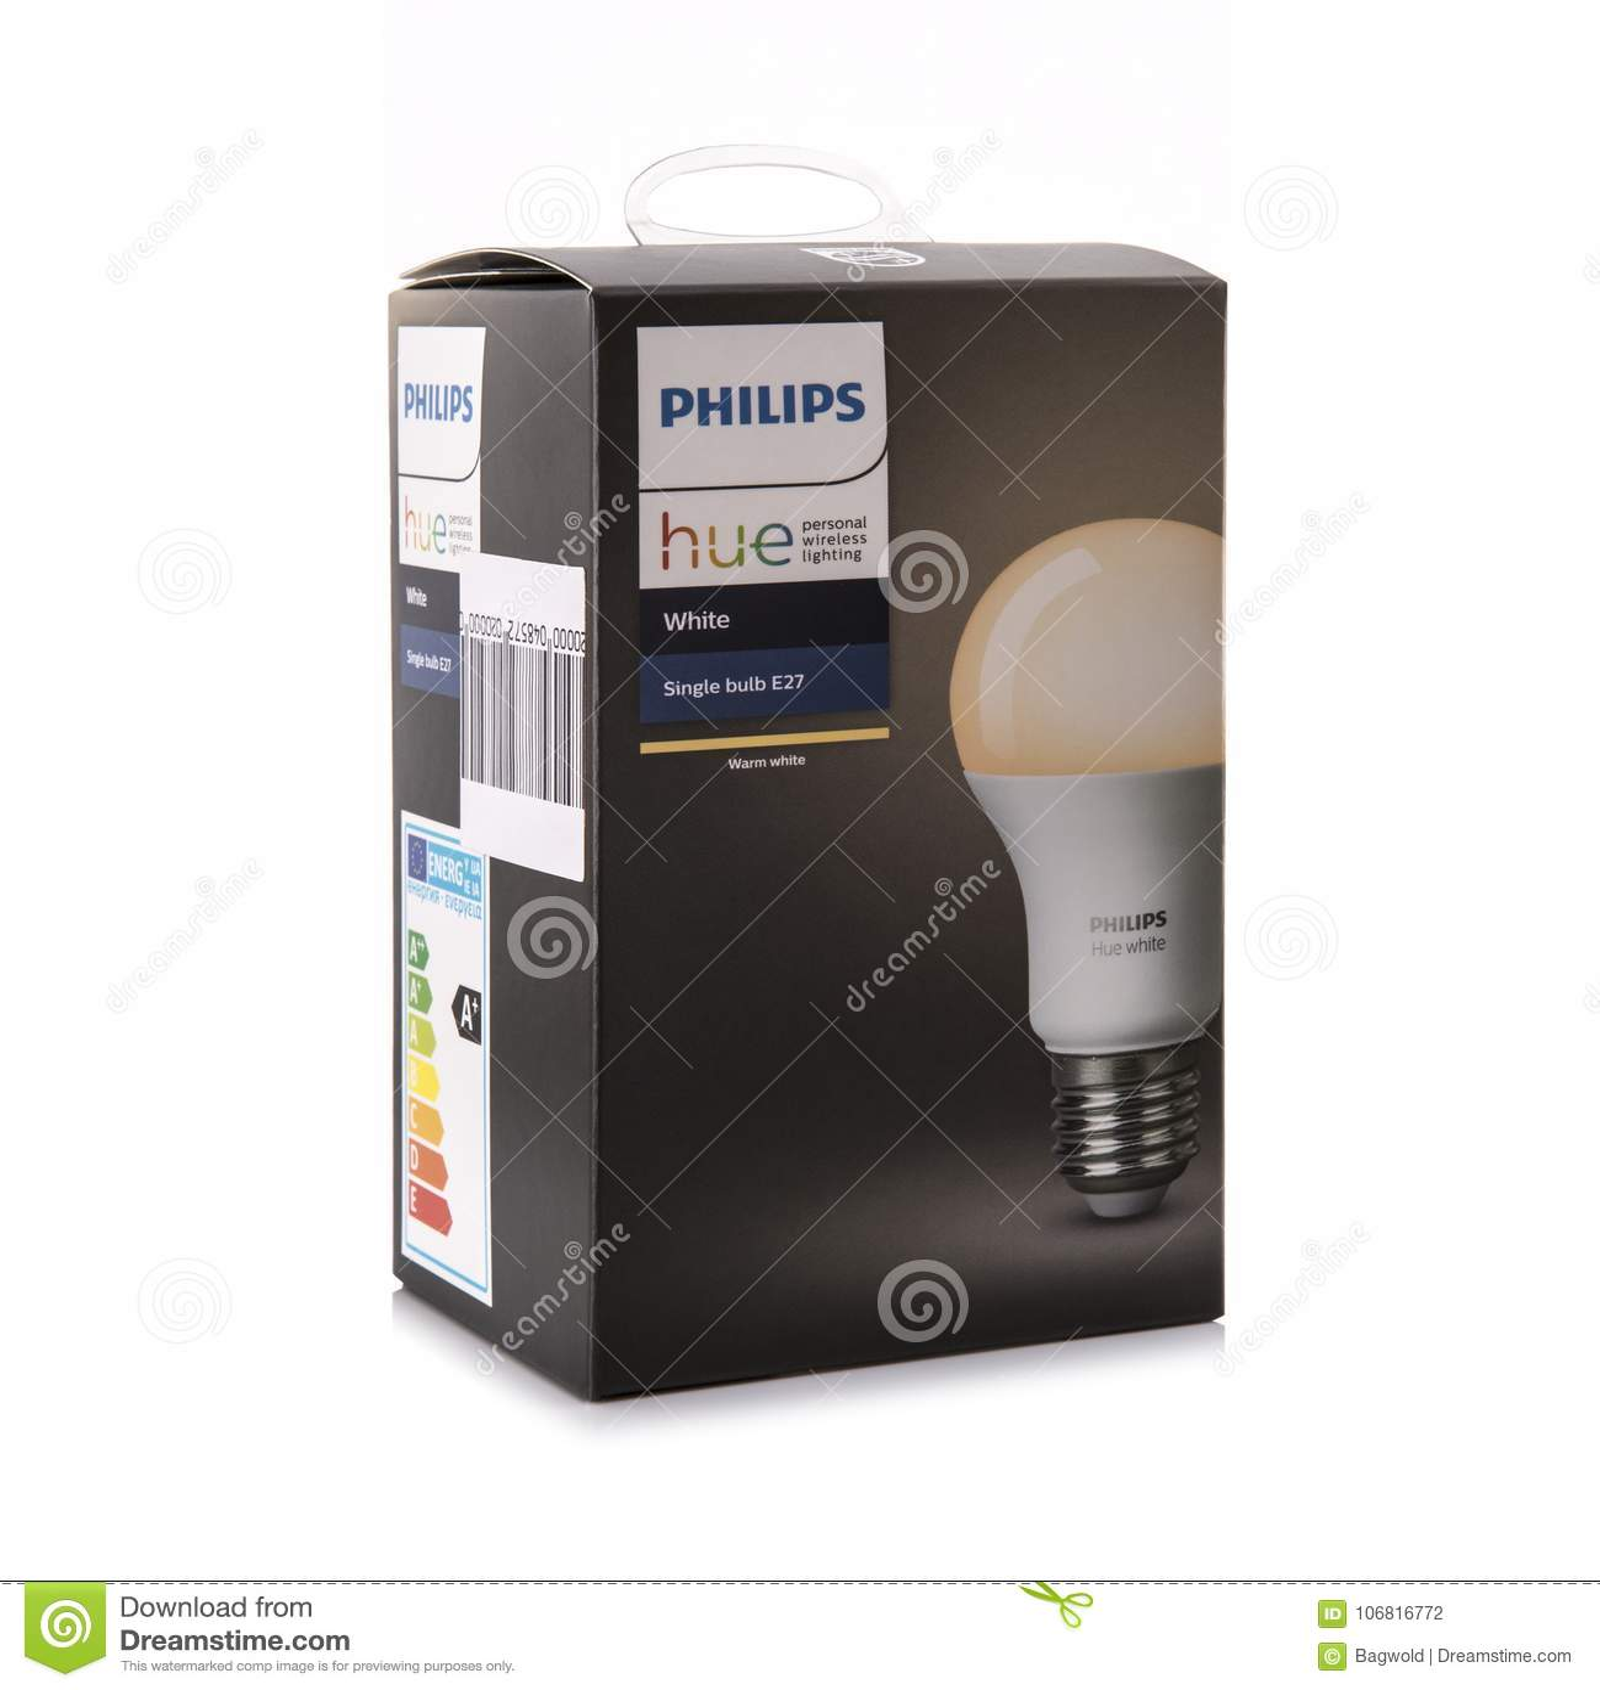 Philips Hue White E27 Smart Bulb, personal wirless lighting